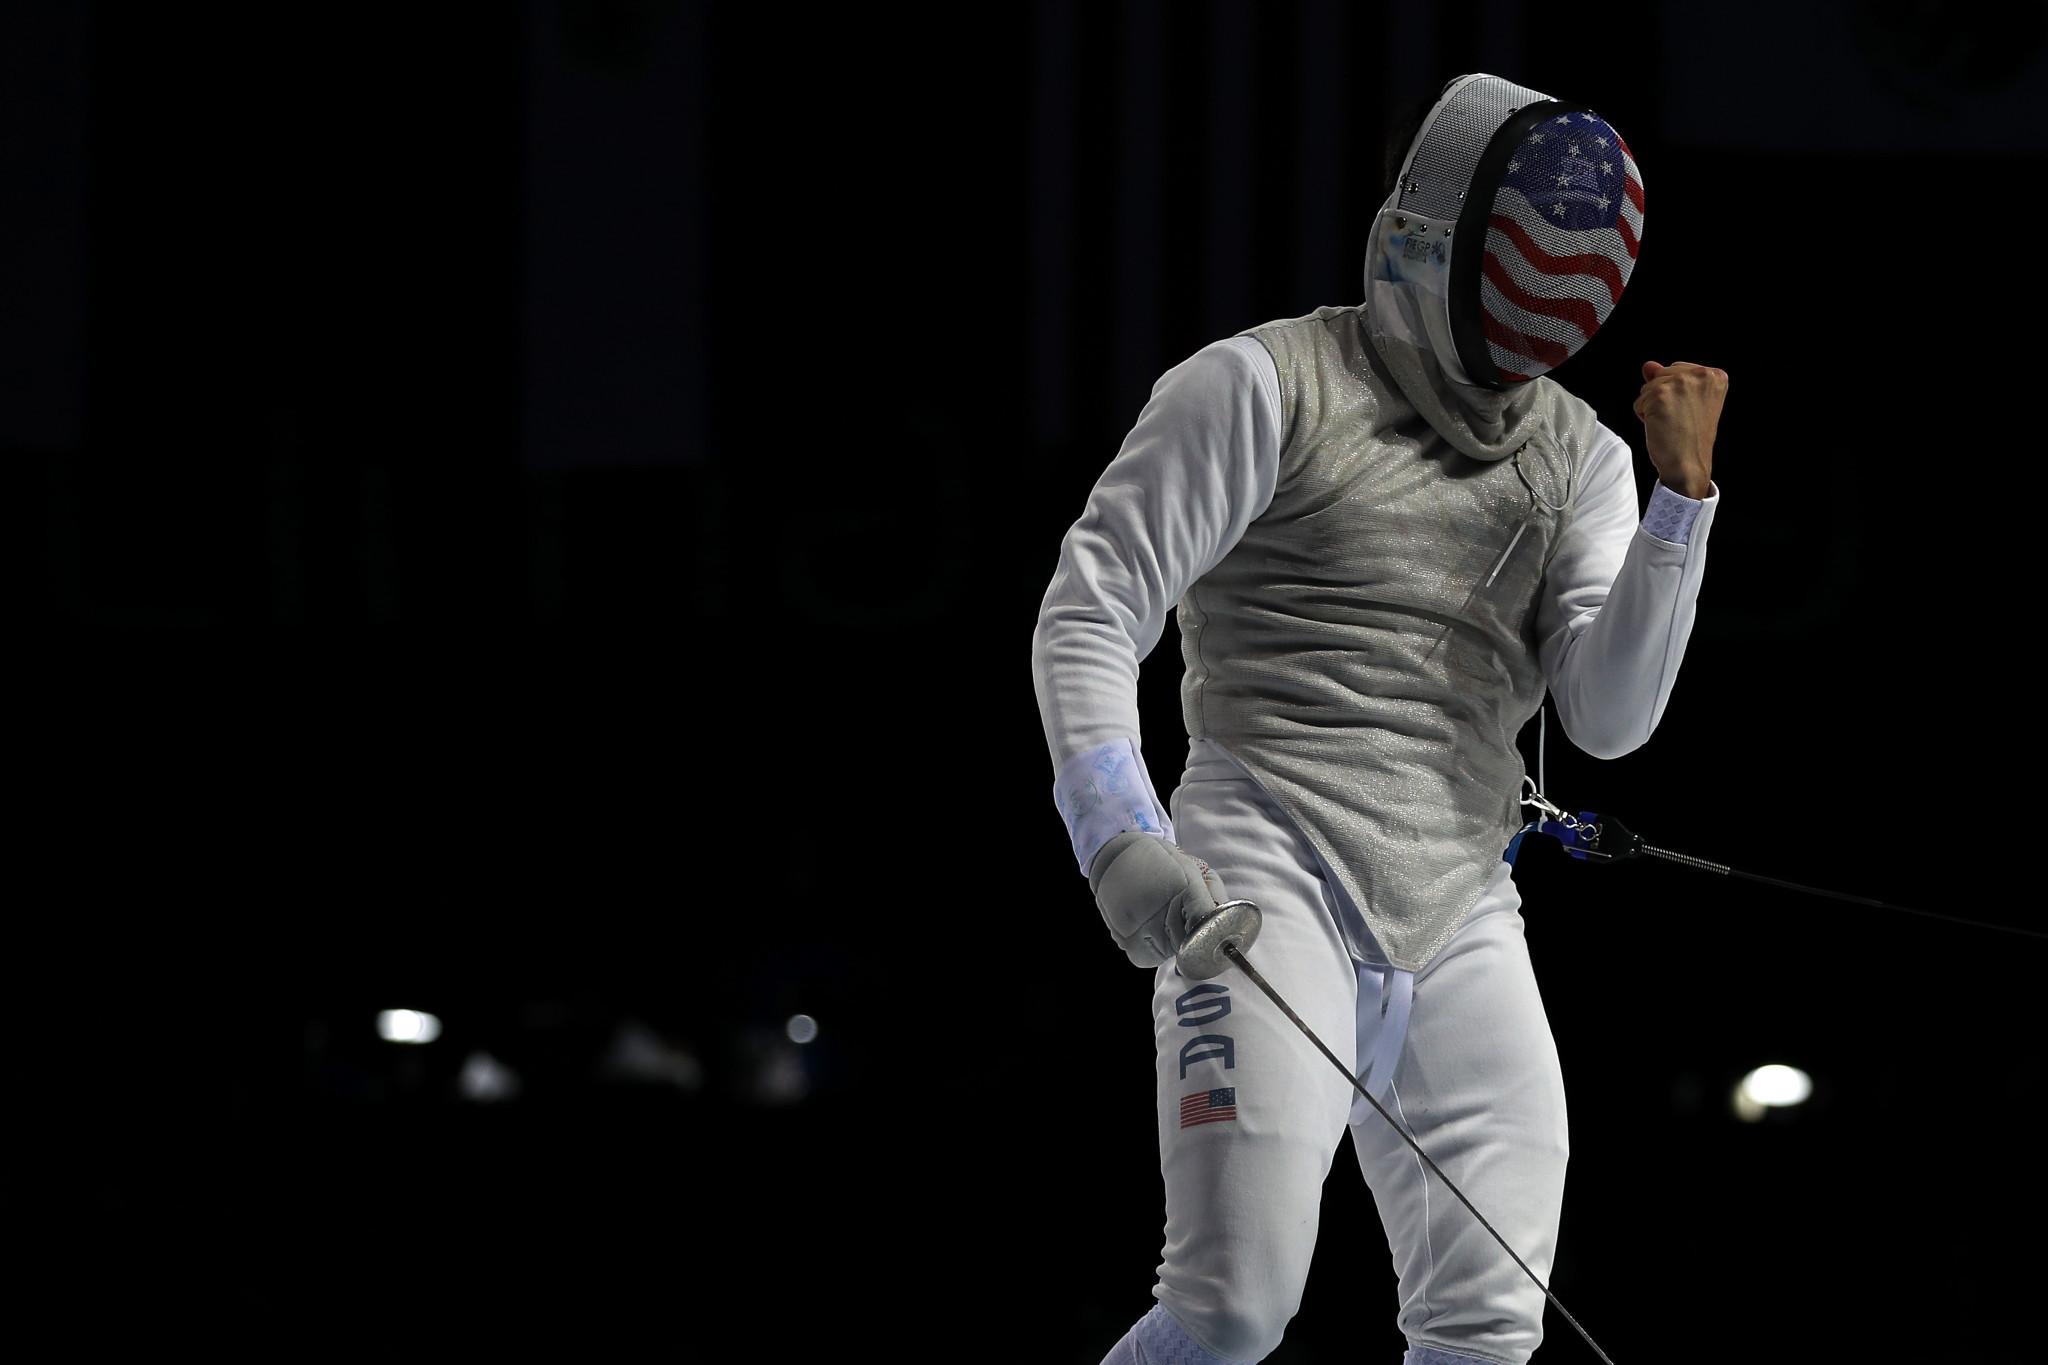 Meinhardt and Deriglazova win foil titles at Fencing Grand Prix of Qatar